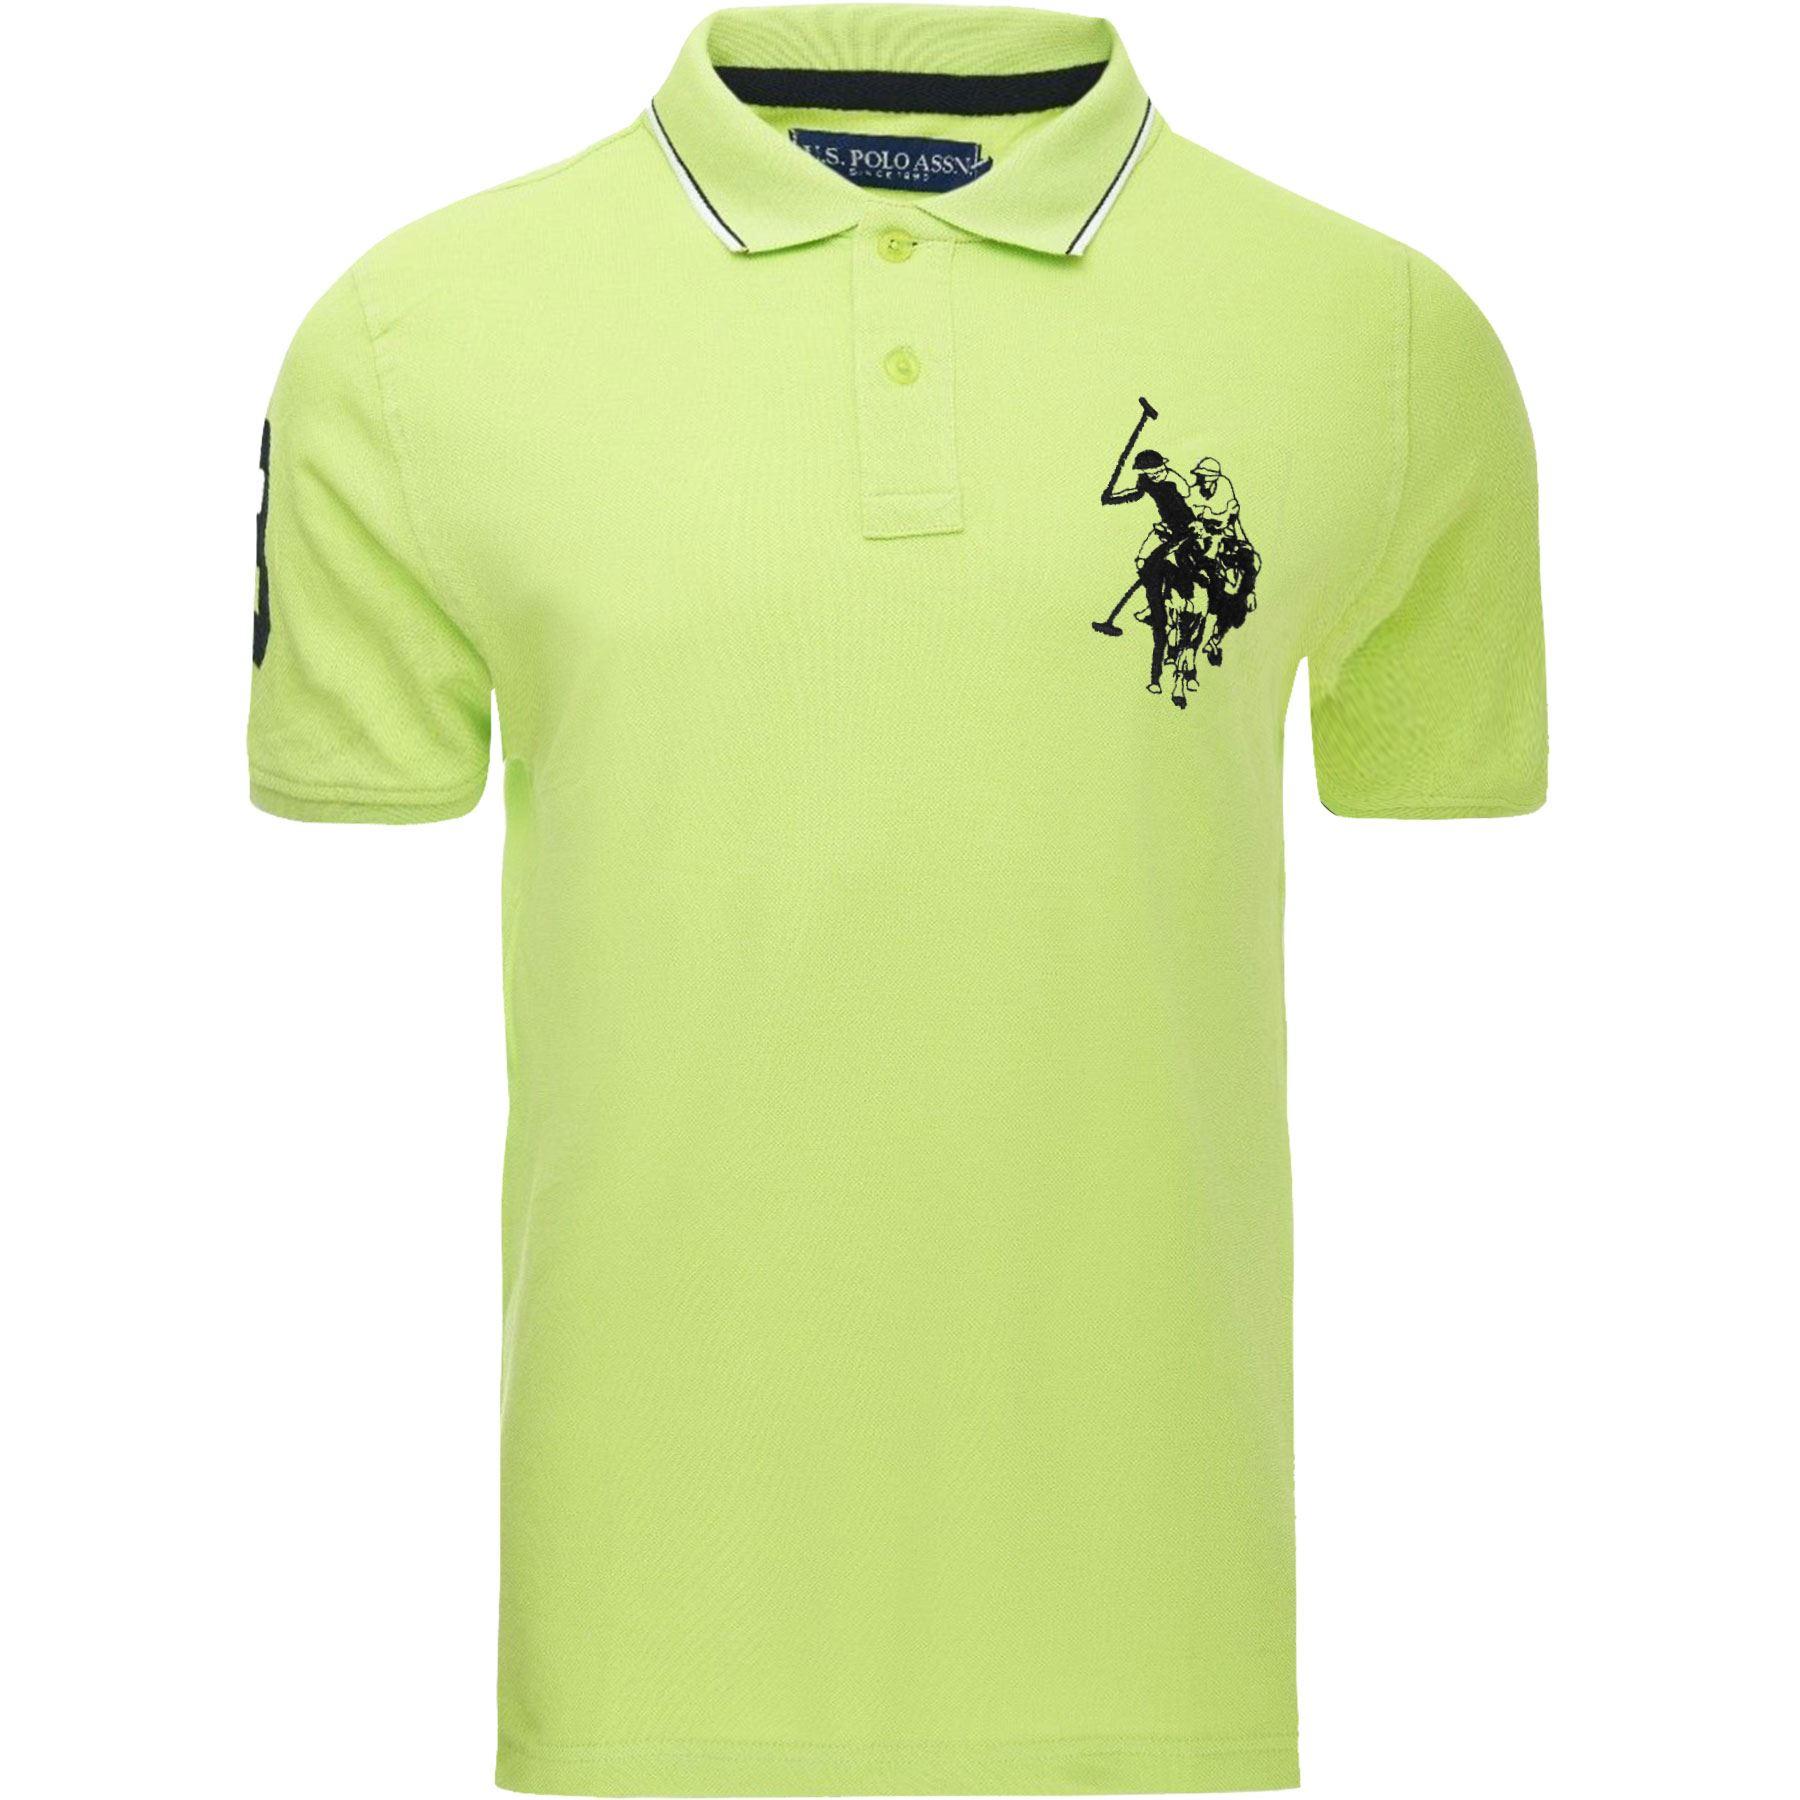 Herren Polo Tshirt Original Top Designer Sommer T Shirt Kurzarm Pony